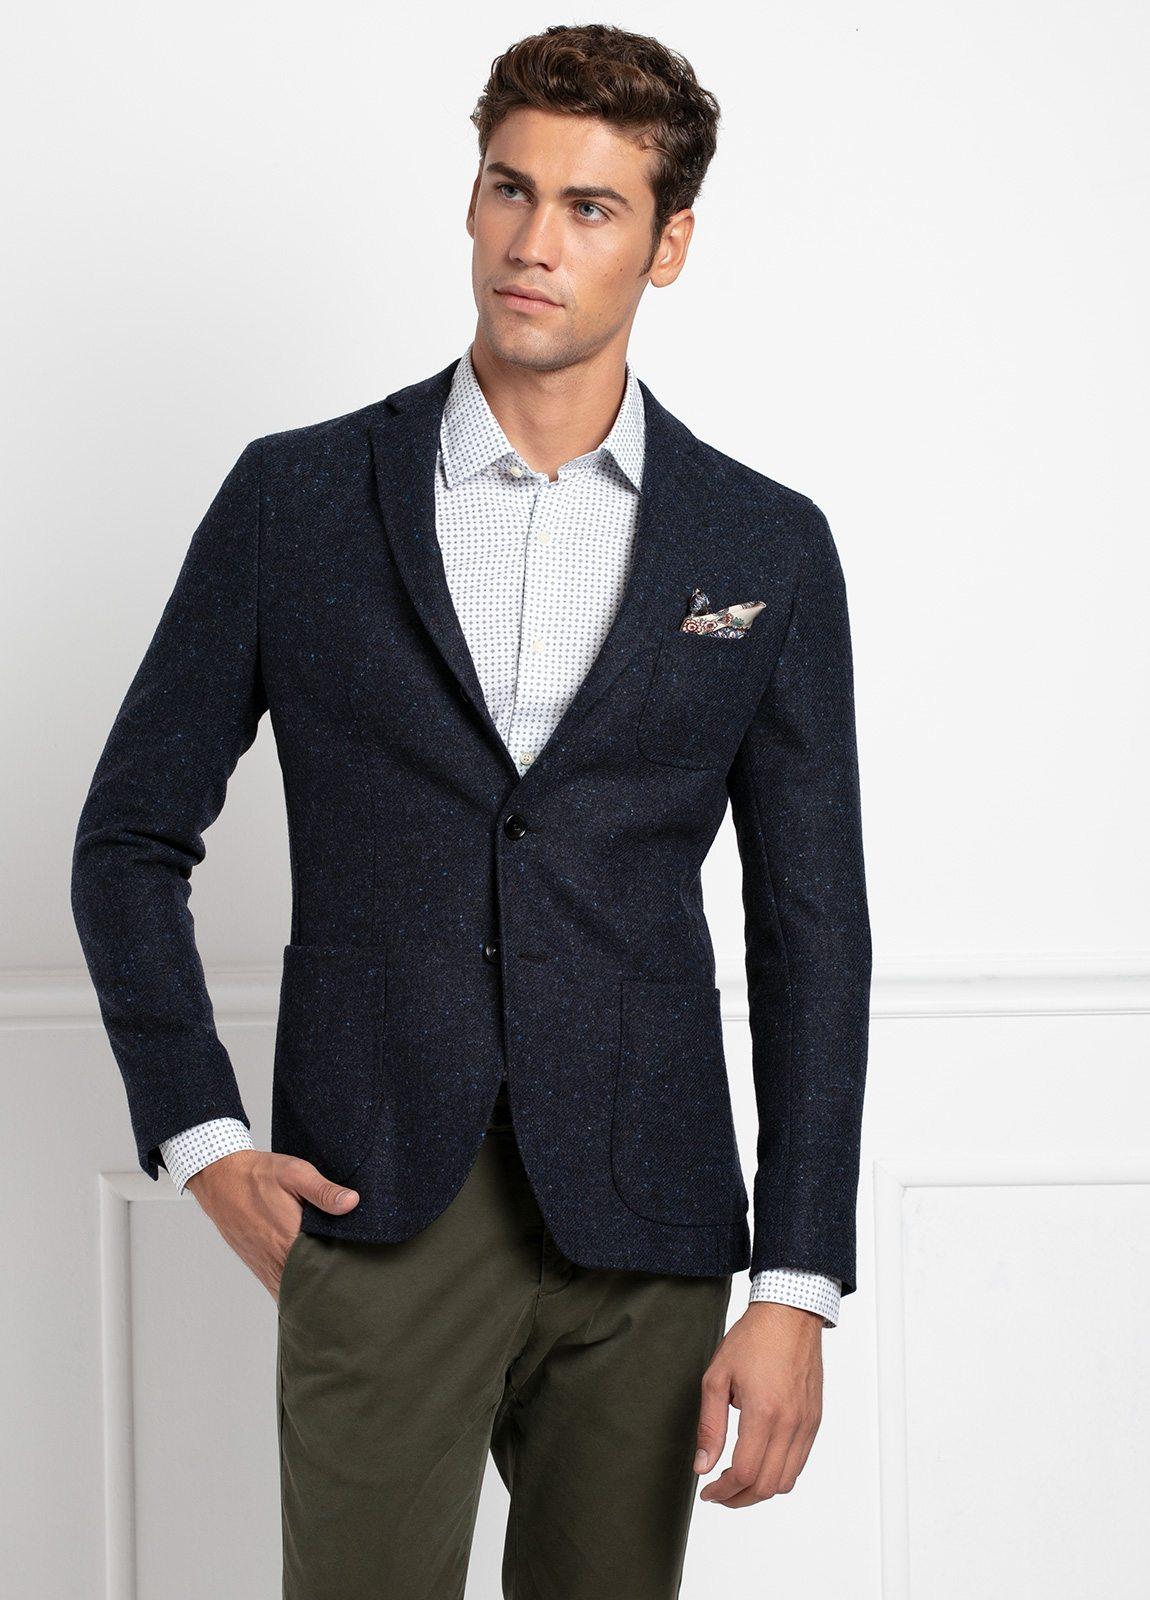 Americana SOFT JACKET Slim Fit, tejido textura color azul oscuro. 100% Lana.